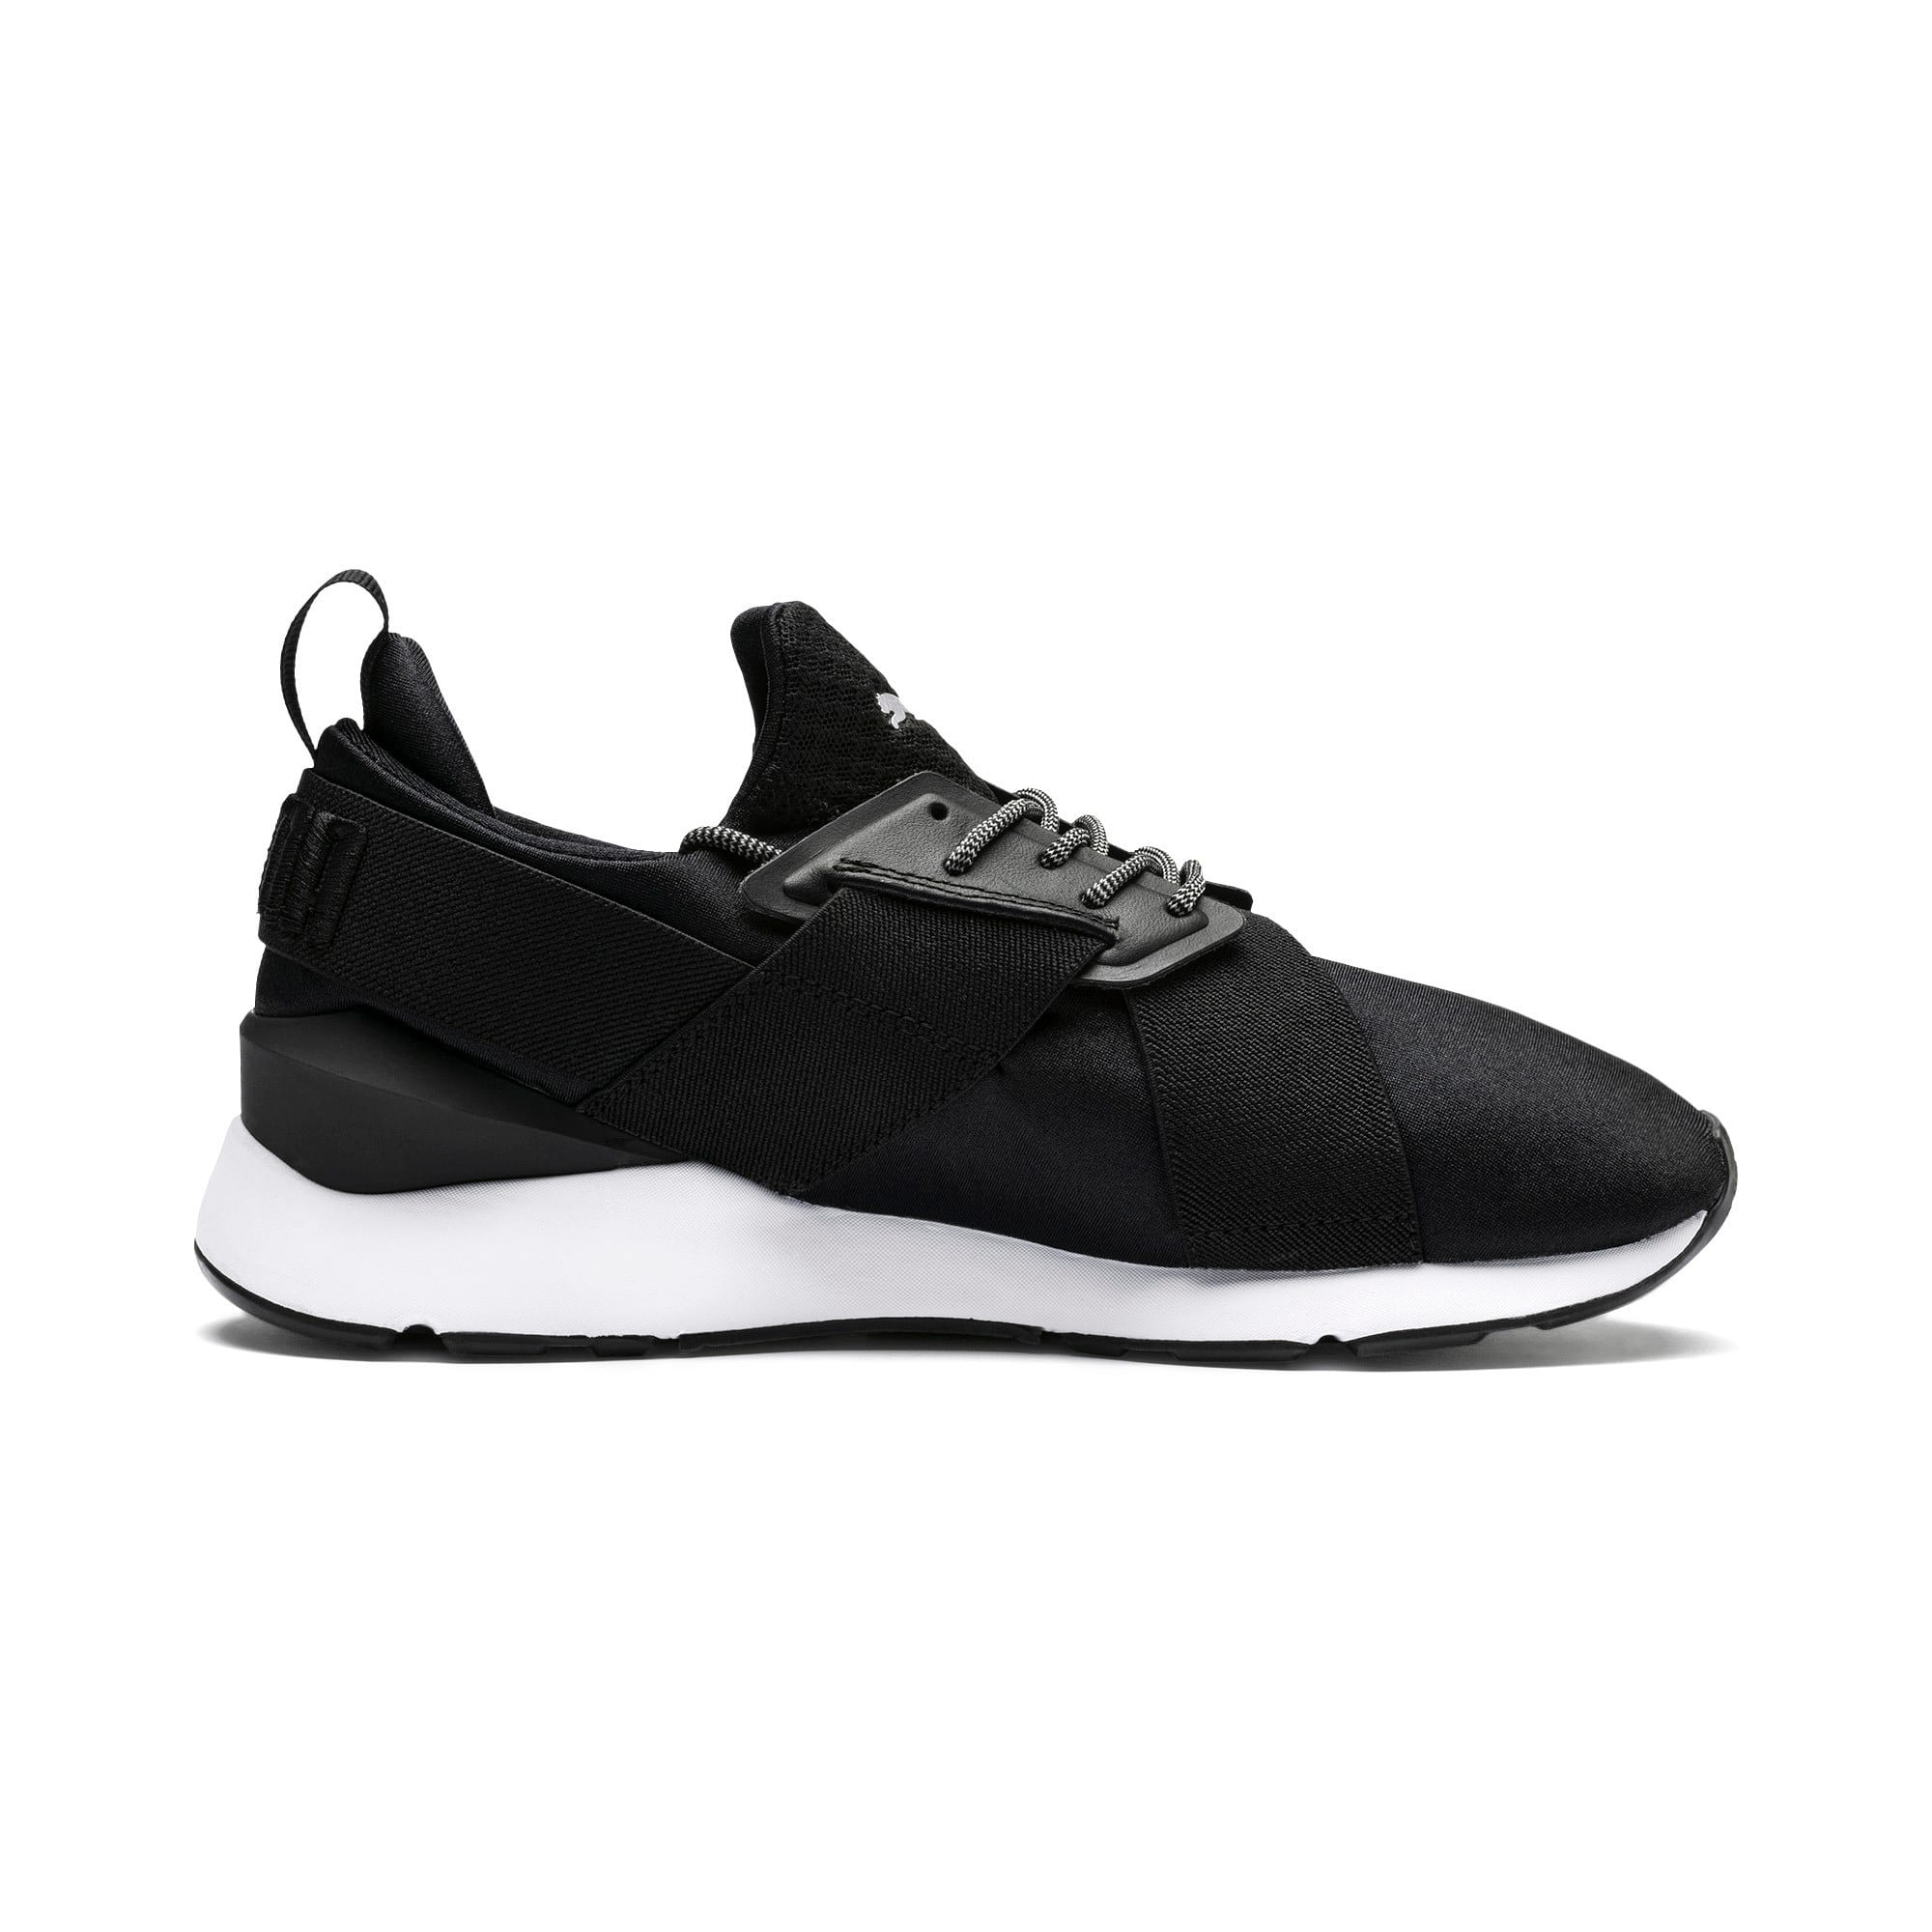 Thumbnail 5 of En Pointe Muse Satin Women's Sneakers, Puma Black-Puma White, medium